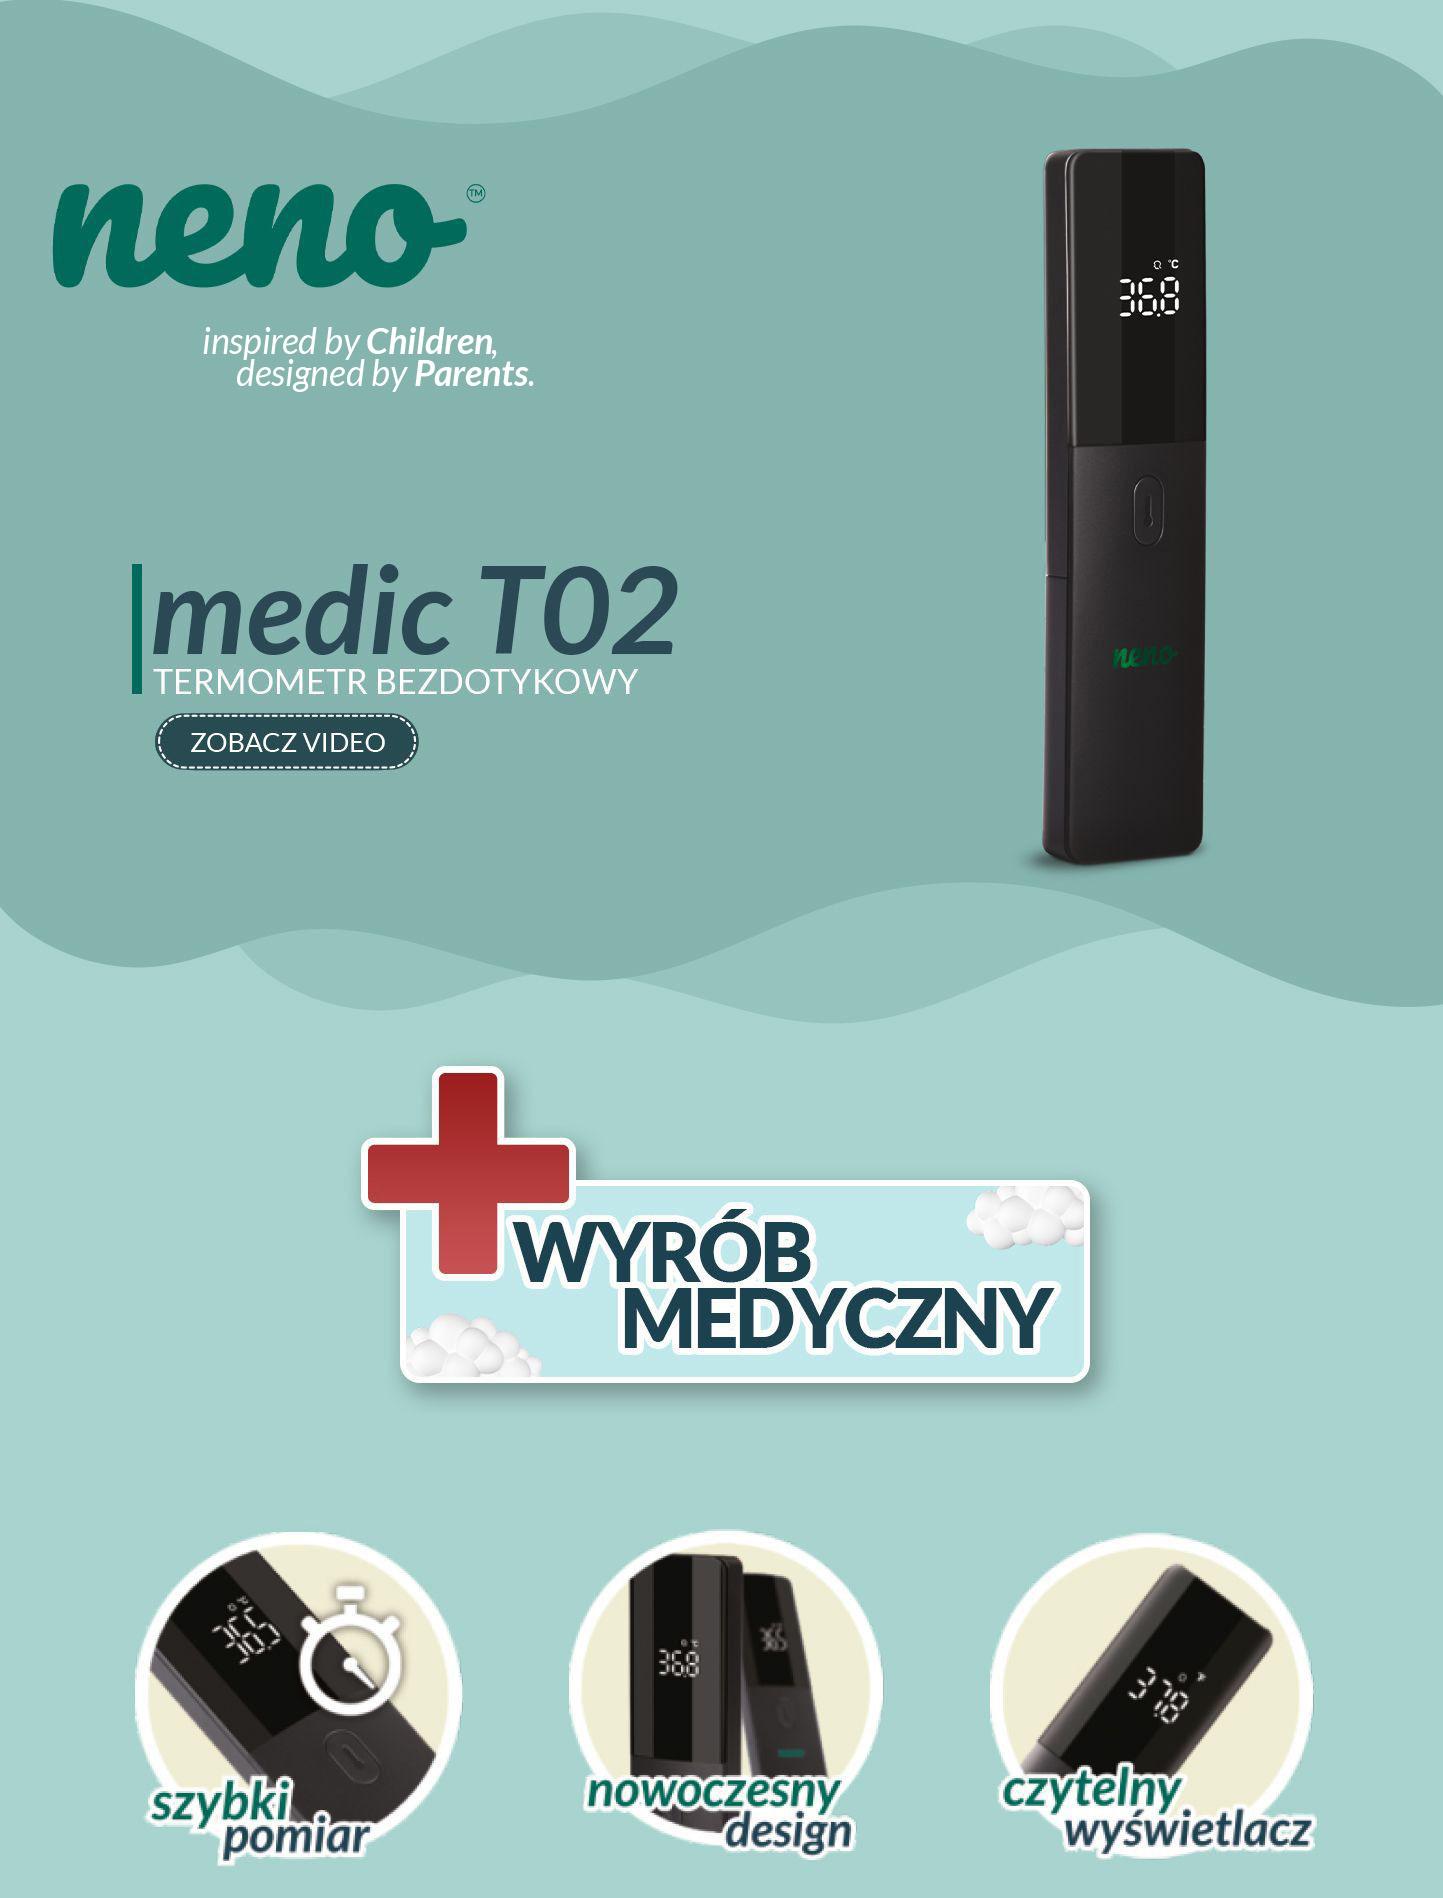 medict02